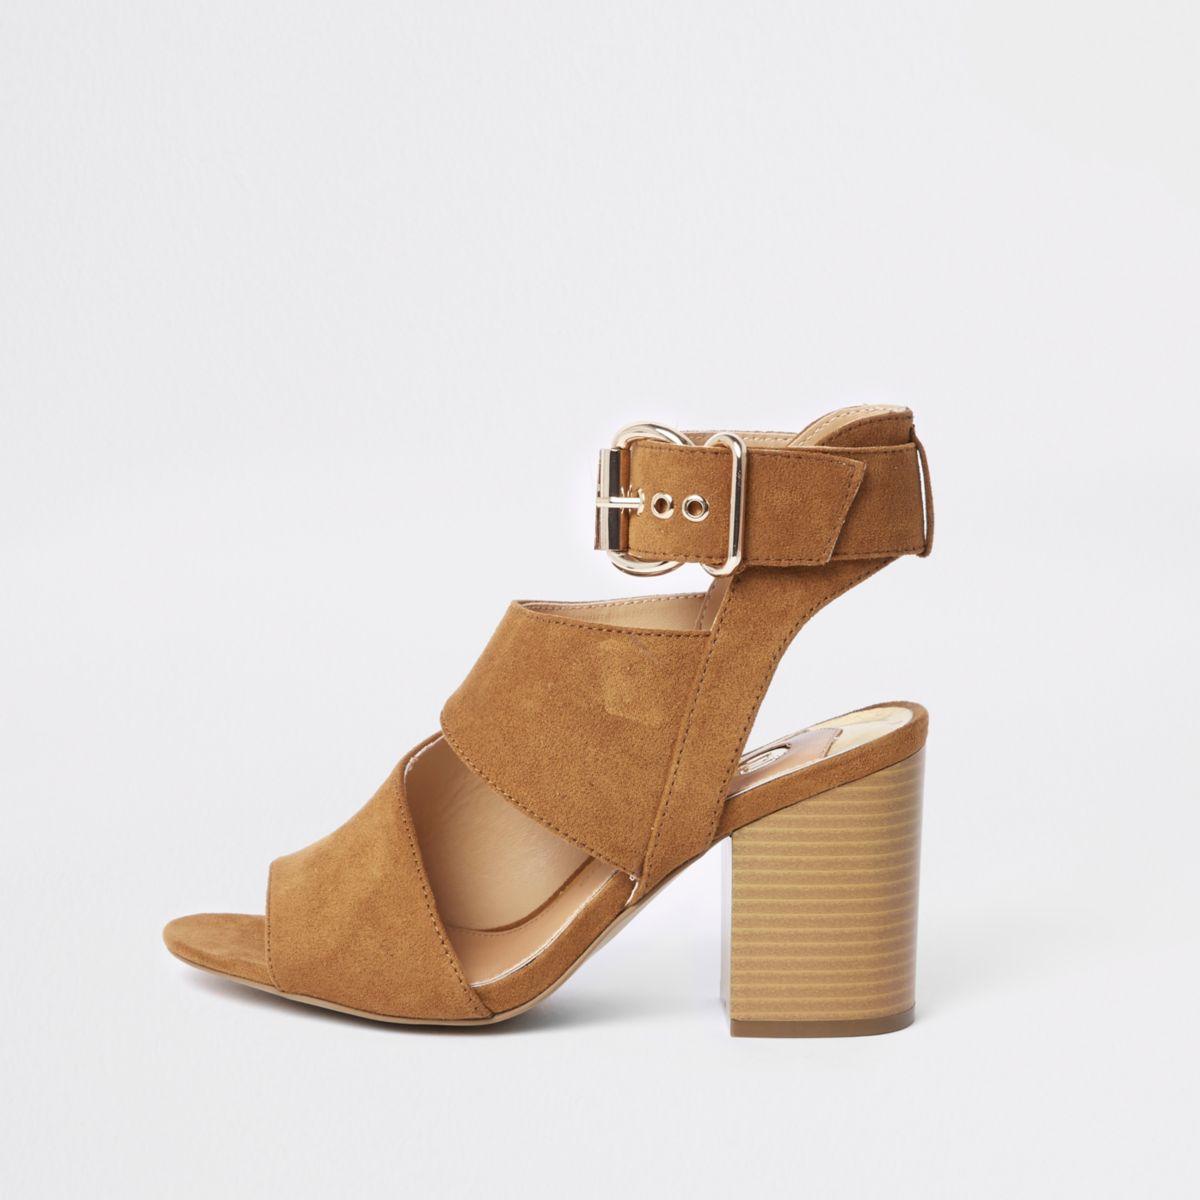 Tan suede buckle shoe boots